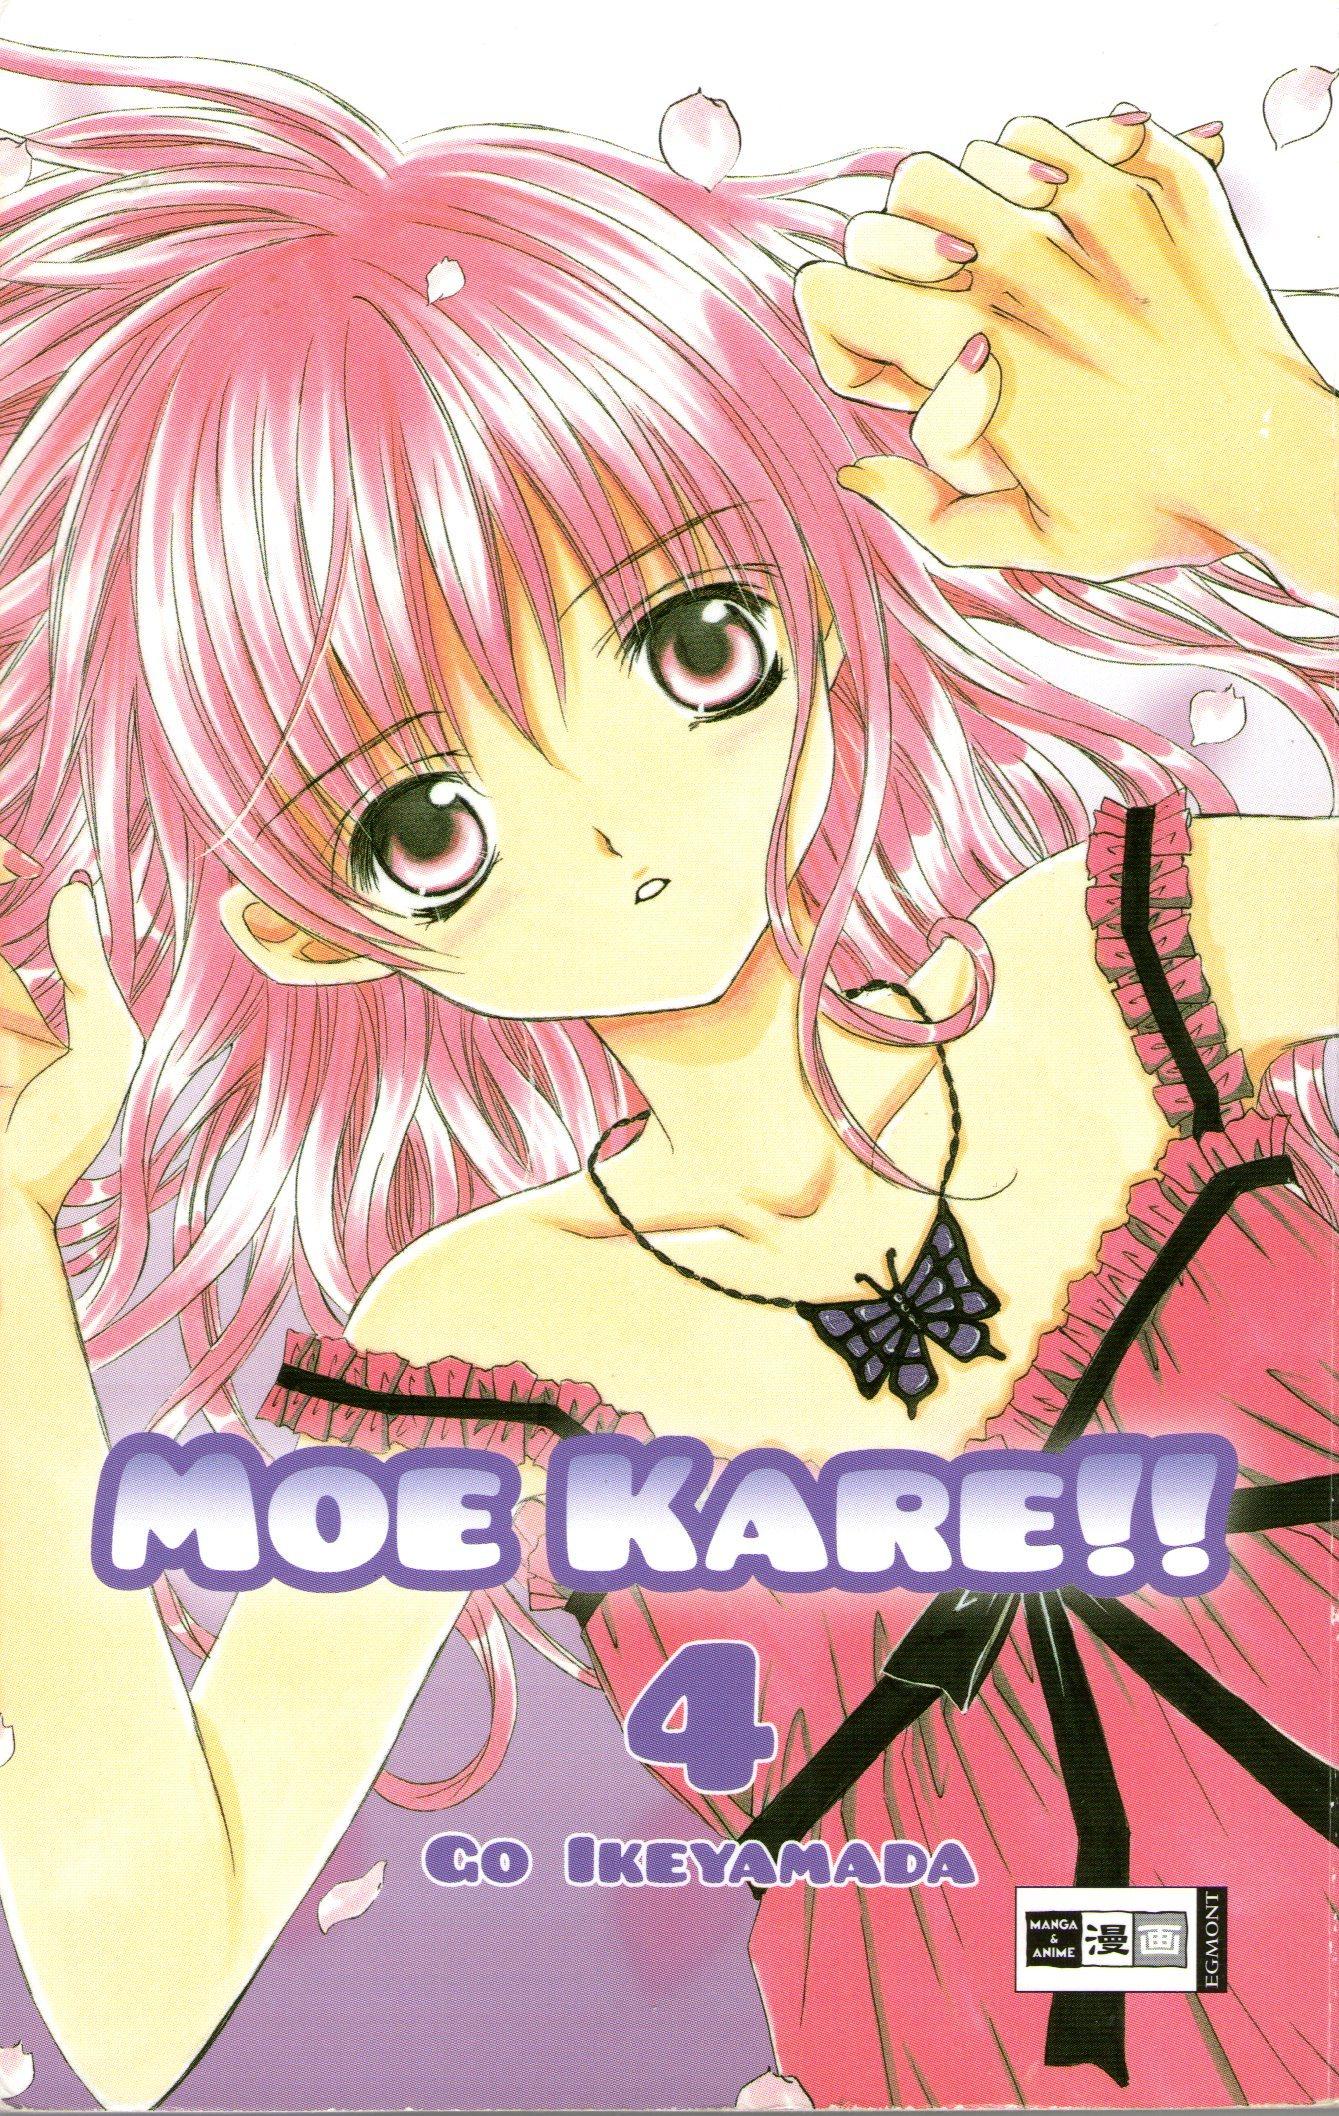 Moe kare!!, Band 4  by  Gō Ikeyamada